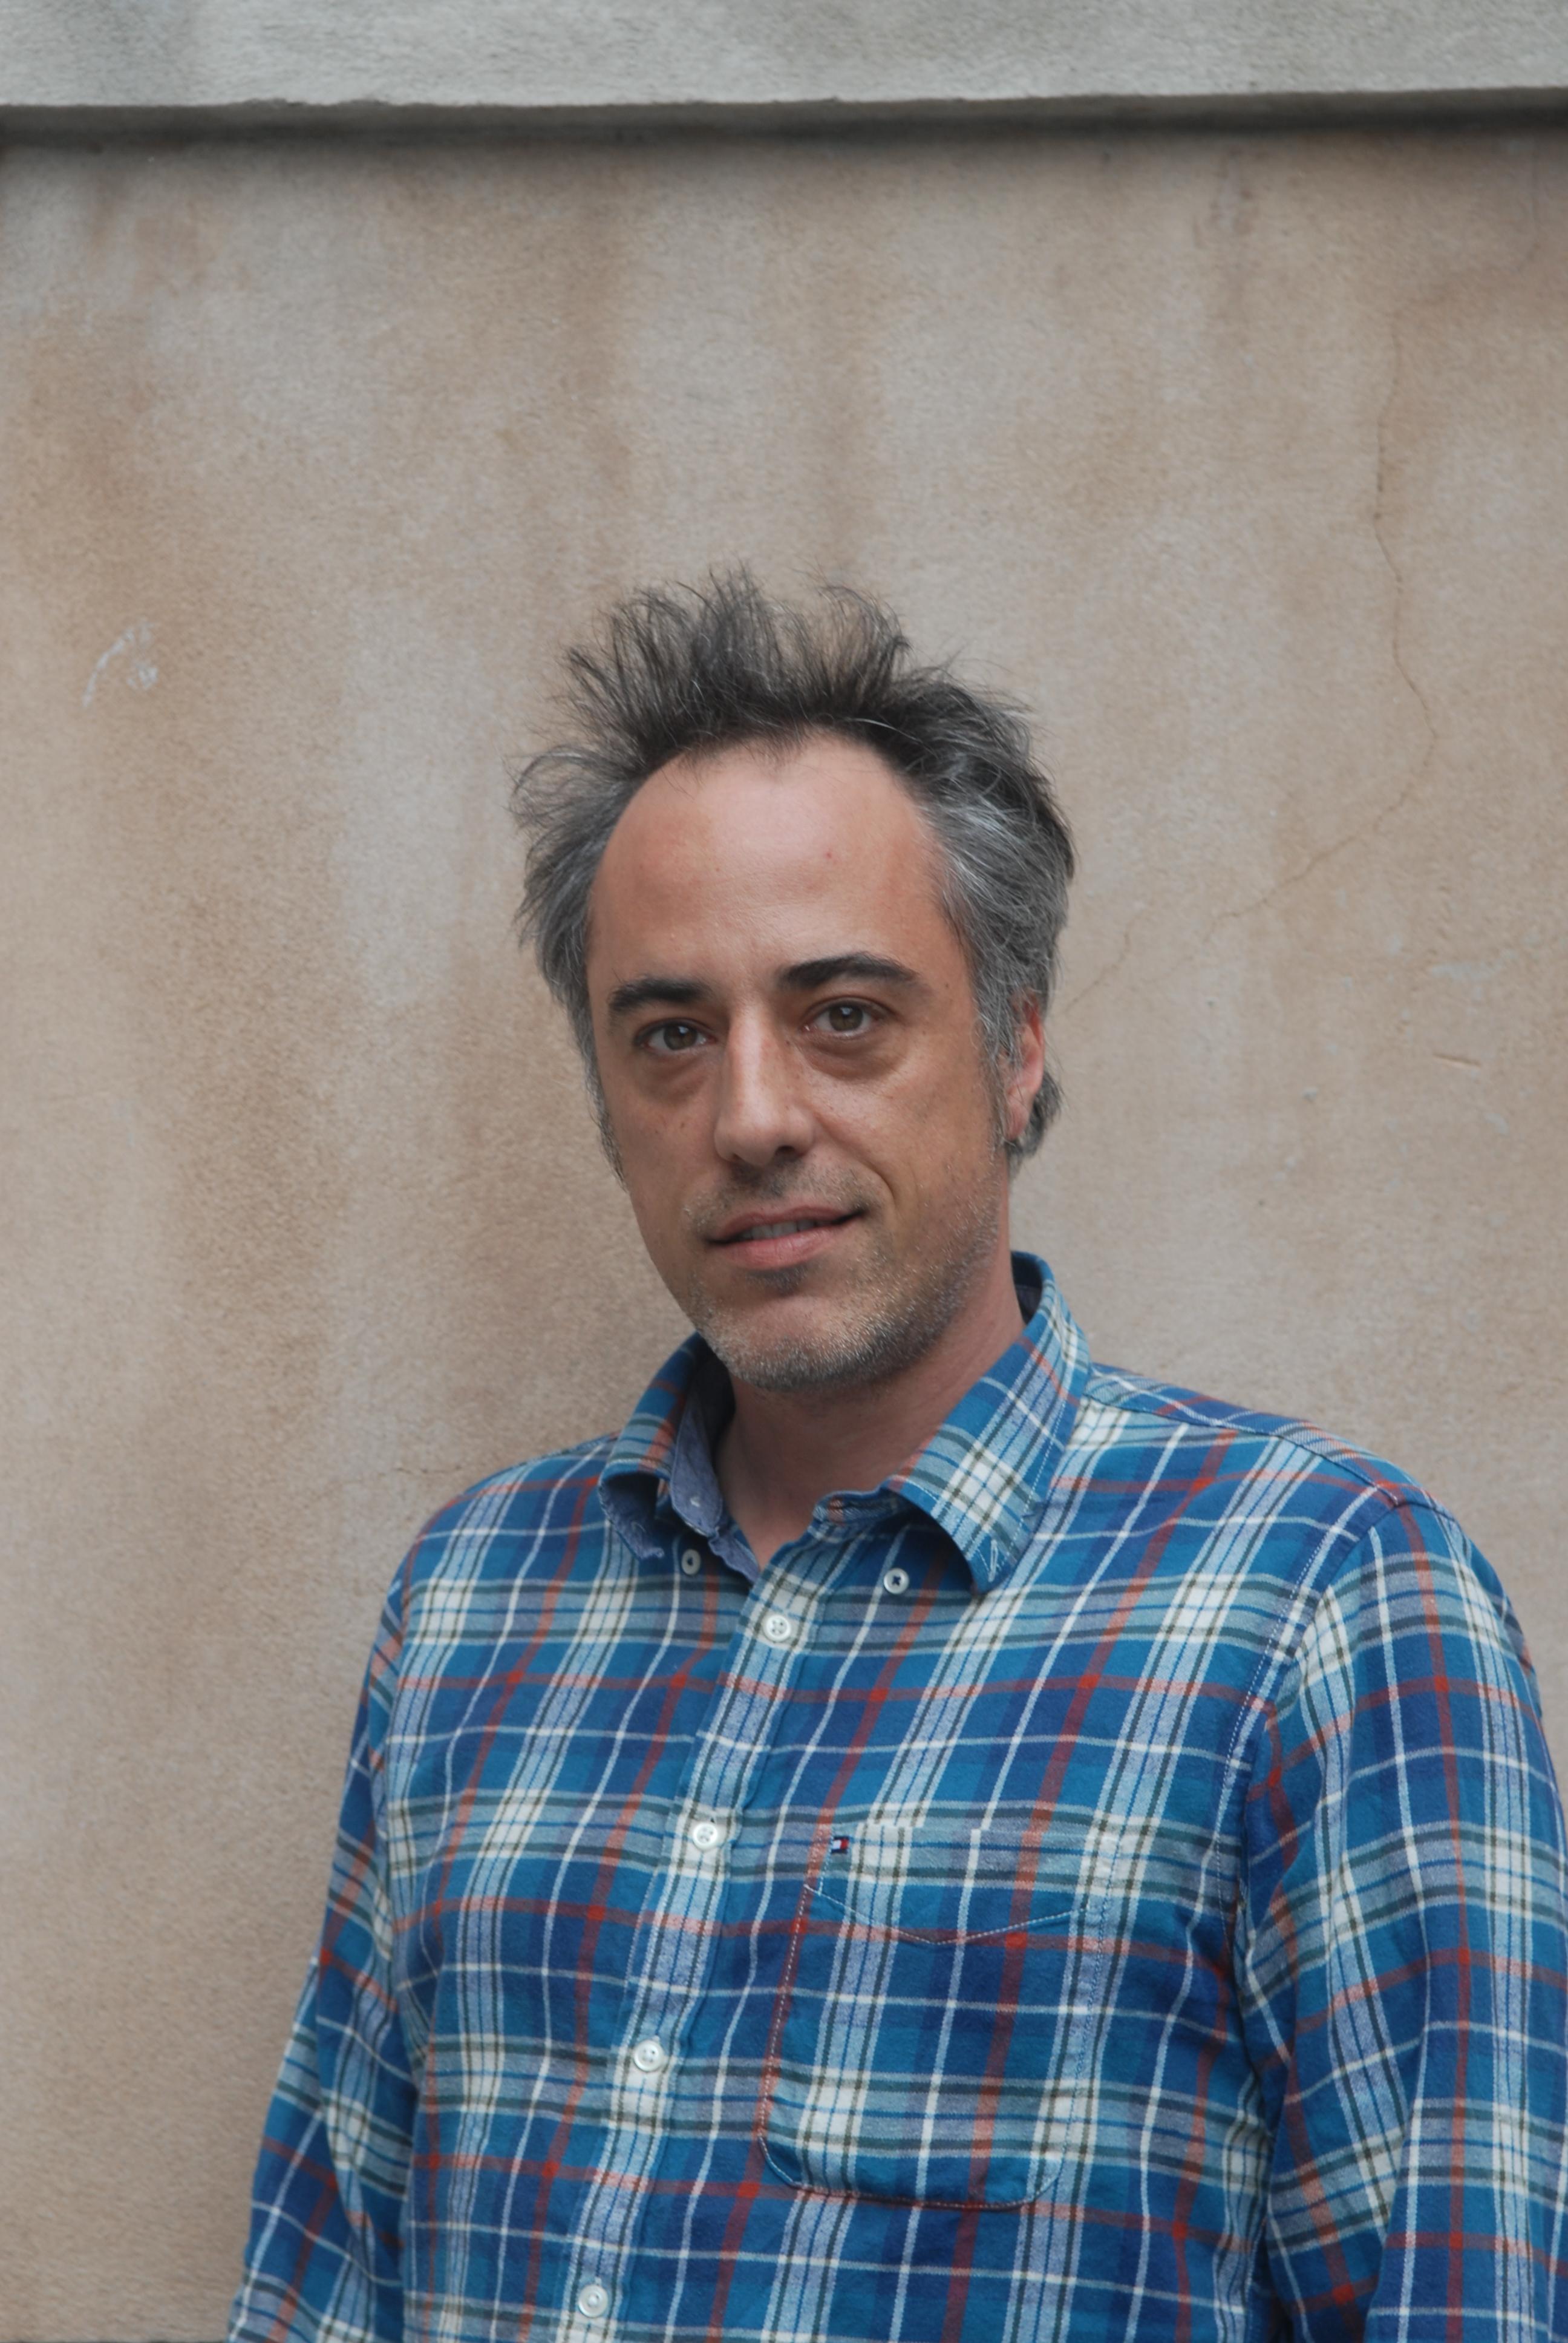 Jon Tafdrup